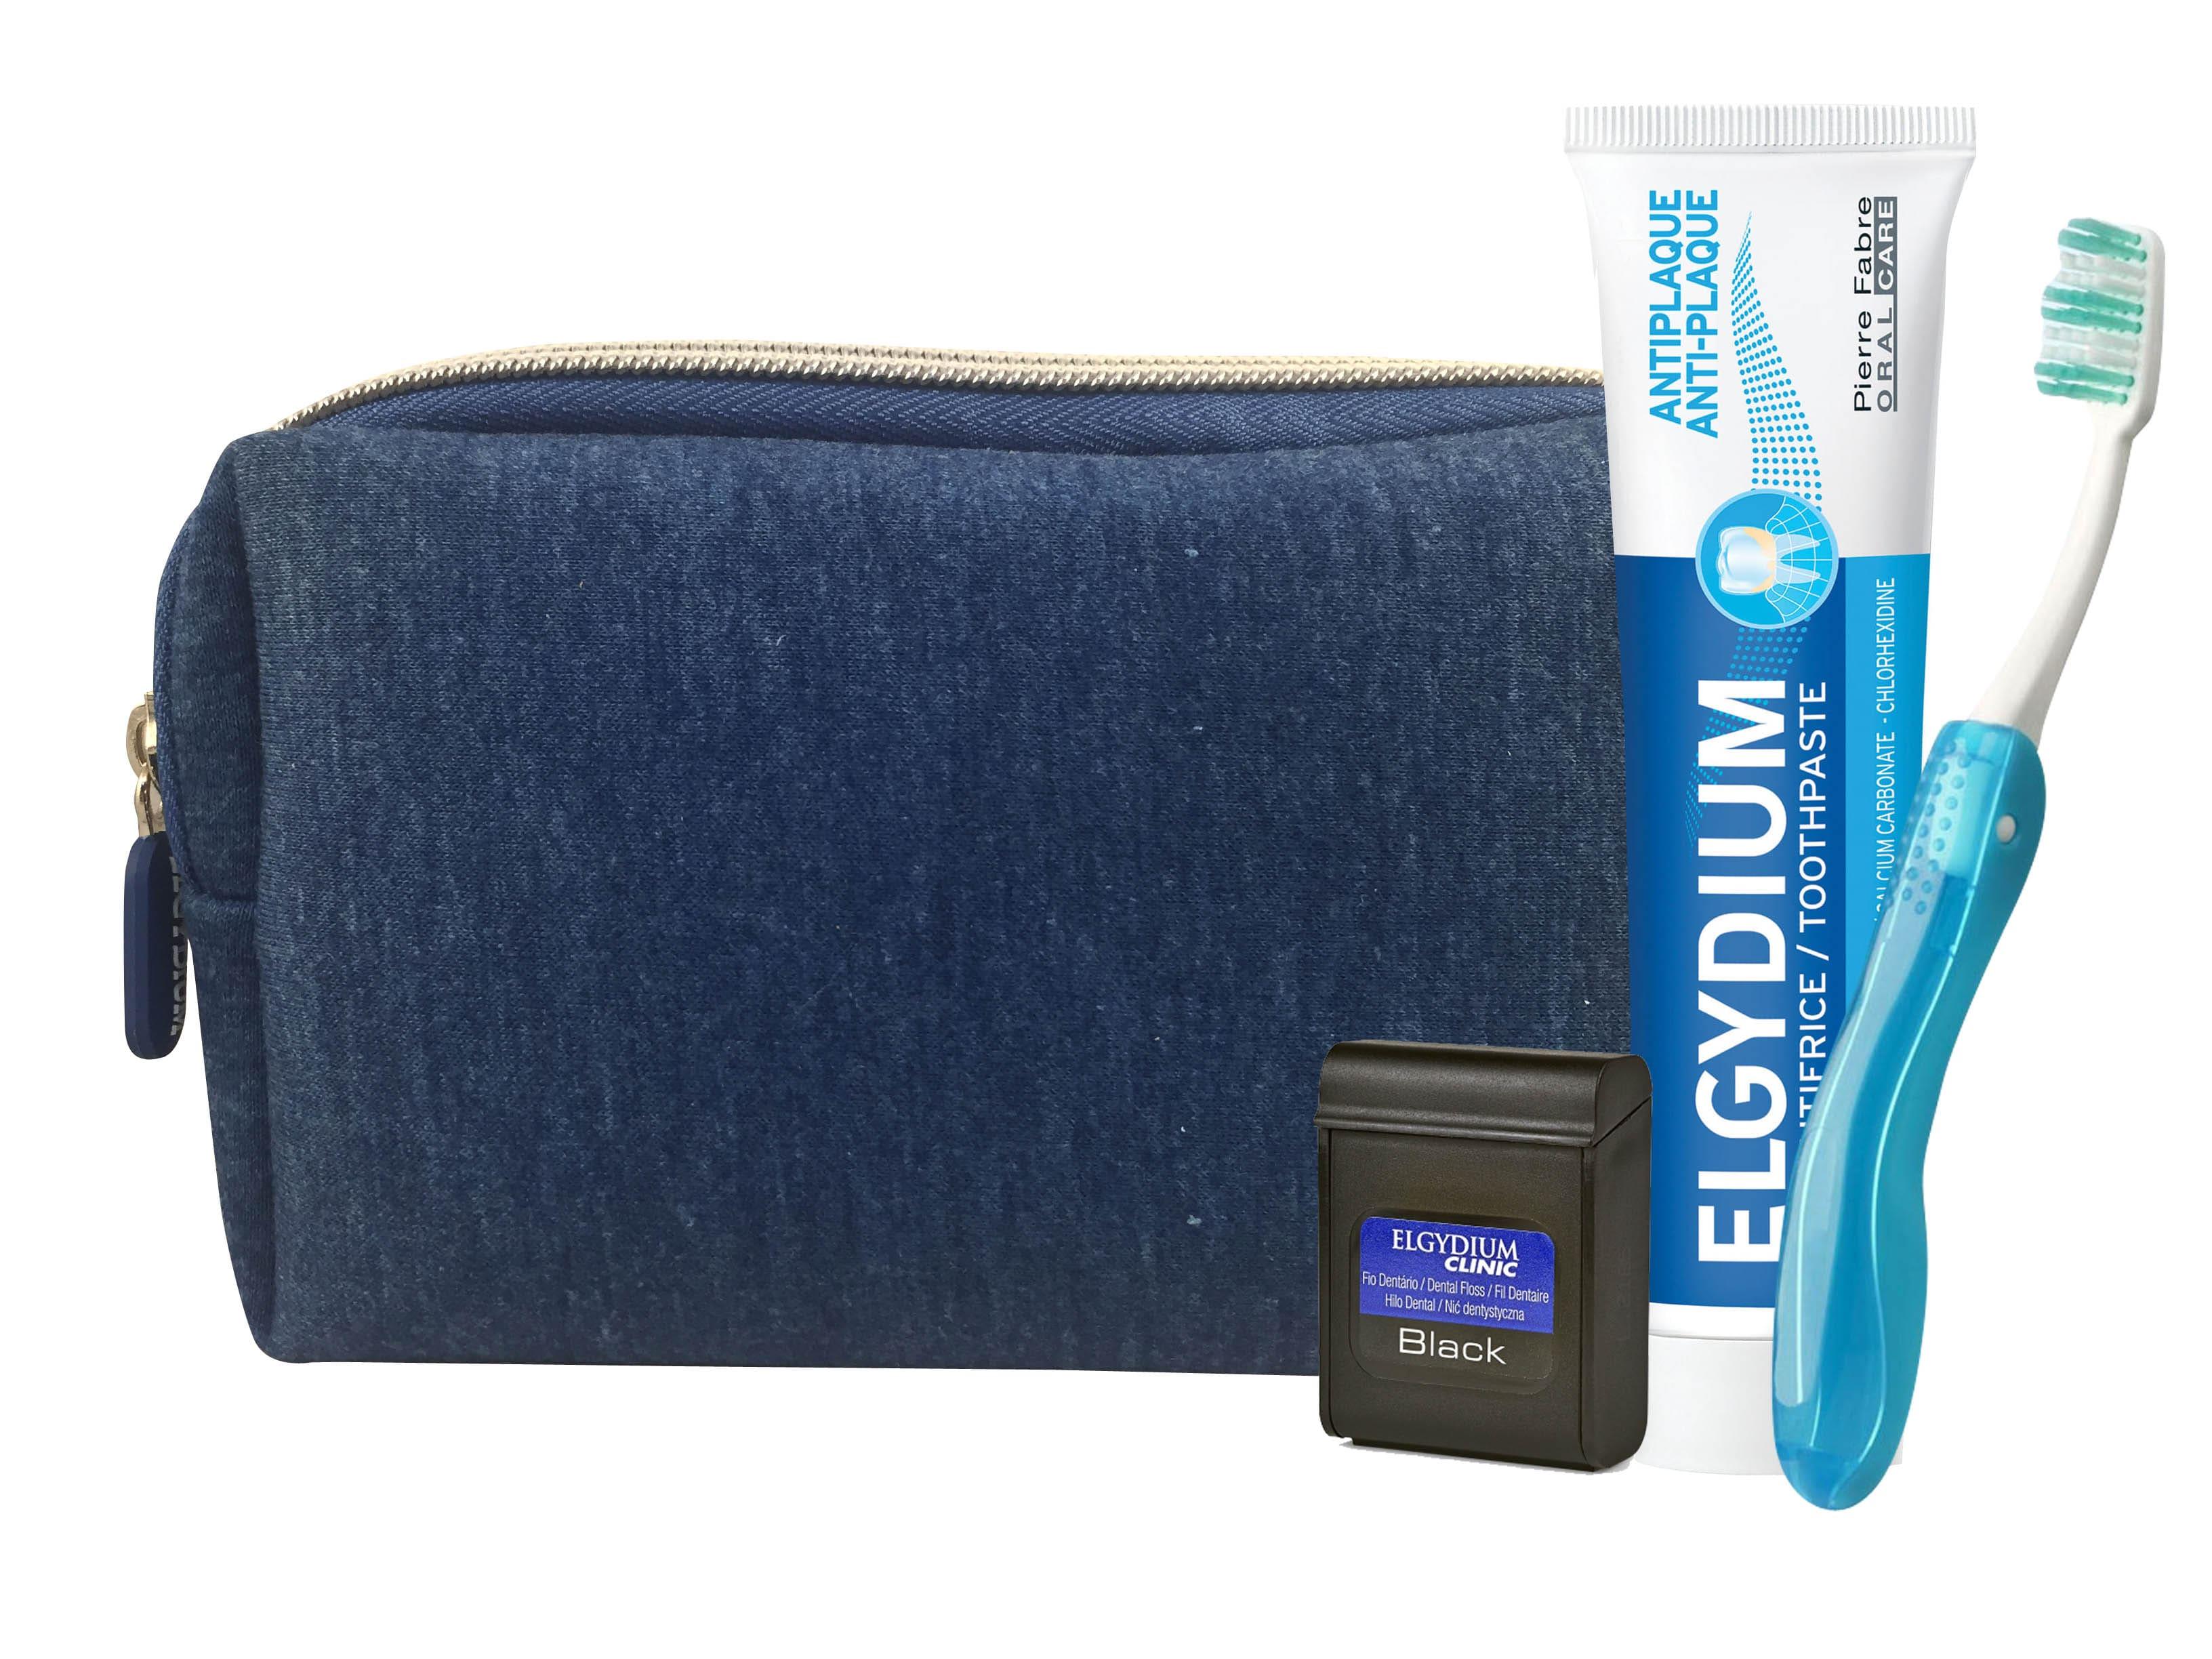 Elgydium Dental Travel Kit με Elgydium Pocket Οδοντόβουρτσα Ταξιδίου, 1 τεμάχιο, Antiplaque Οδοντόκρεμα κατά της πλάκας, 50ml & Dental Floss Black Οδοντικό Νήμα με Μαύρο Χρώμα, 5m σε μπλε τσαντάκι μεταφοράς